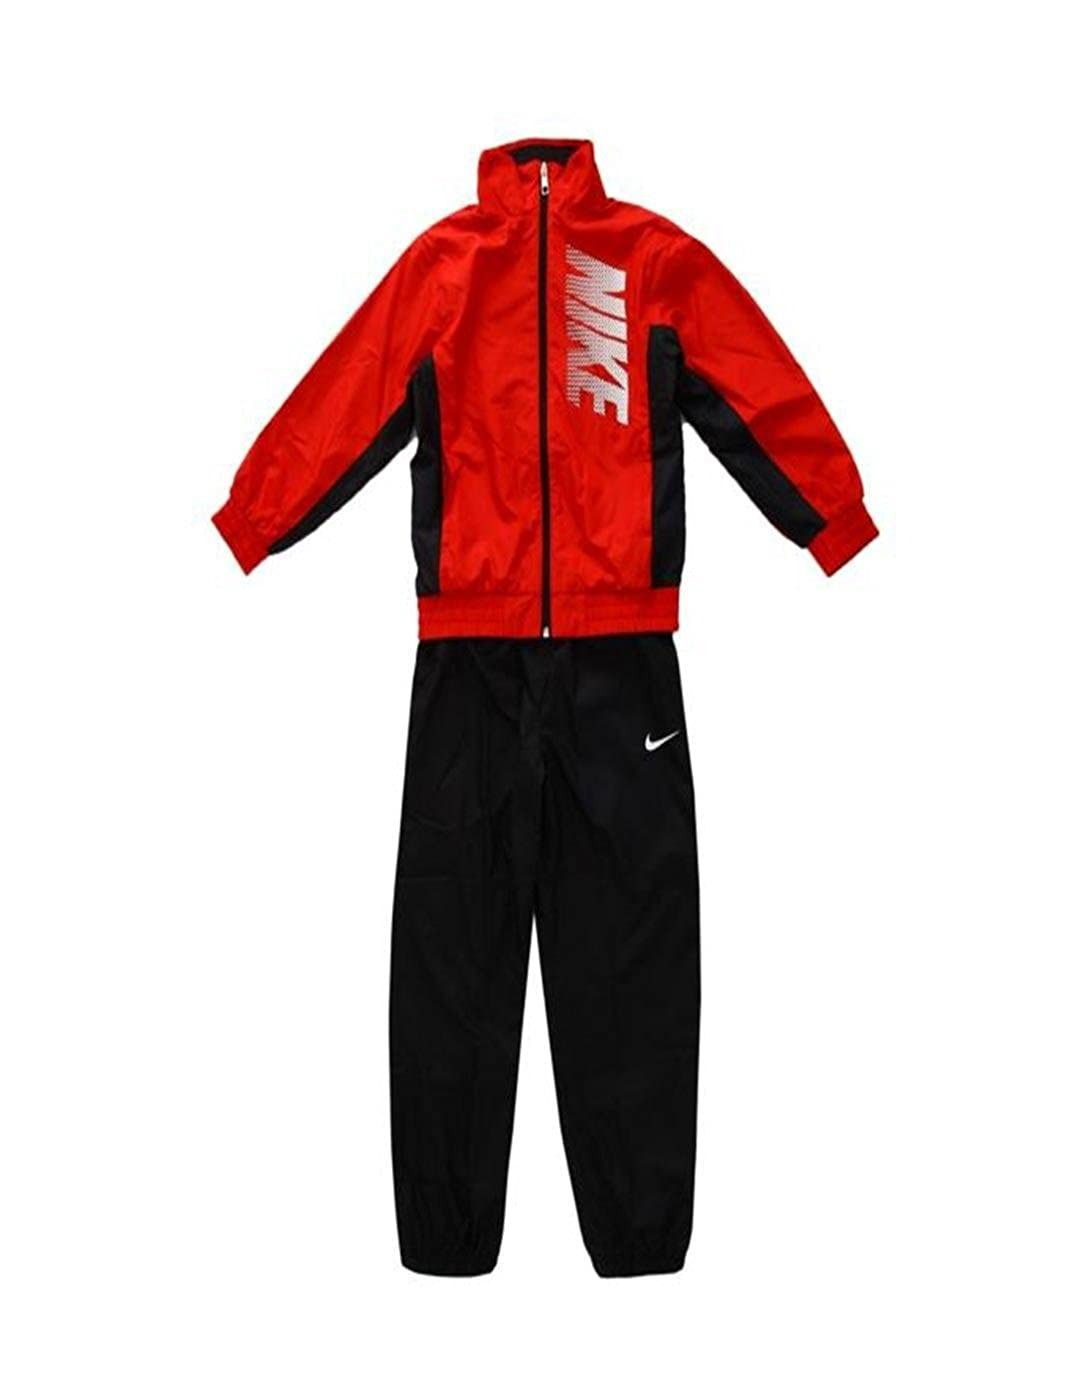 Nike Chã¡Ndal Junior Adj Rojo 16 A: Amazon.es: Ropa y accesorios